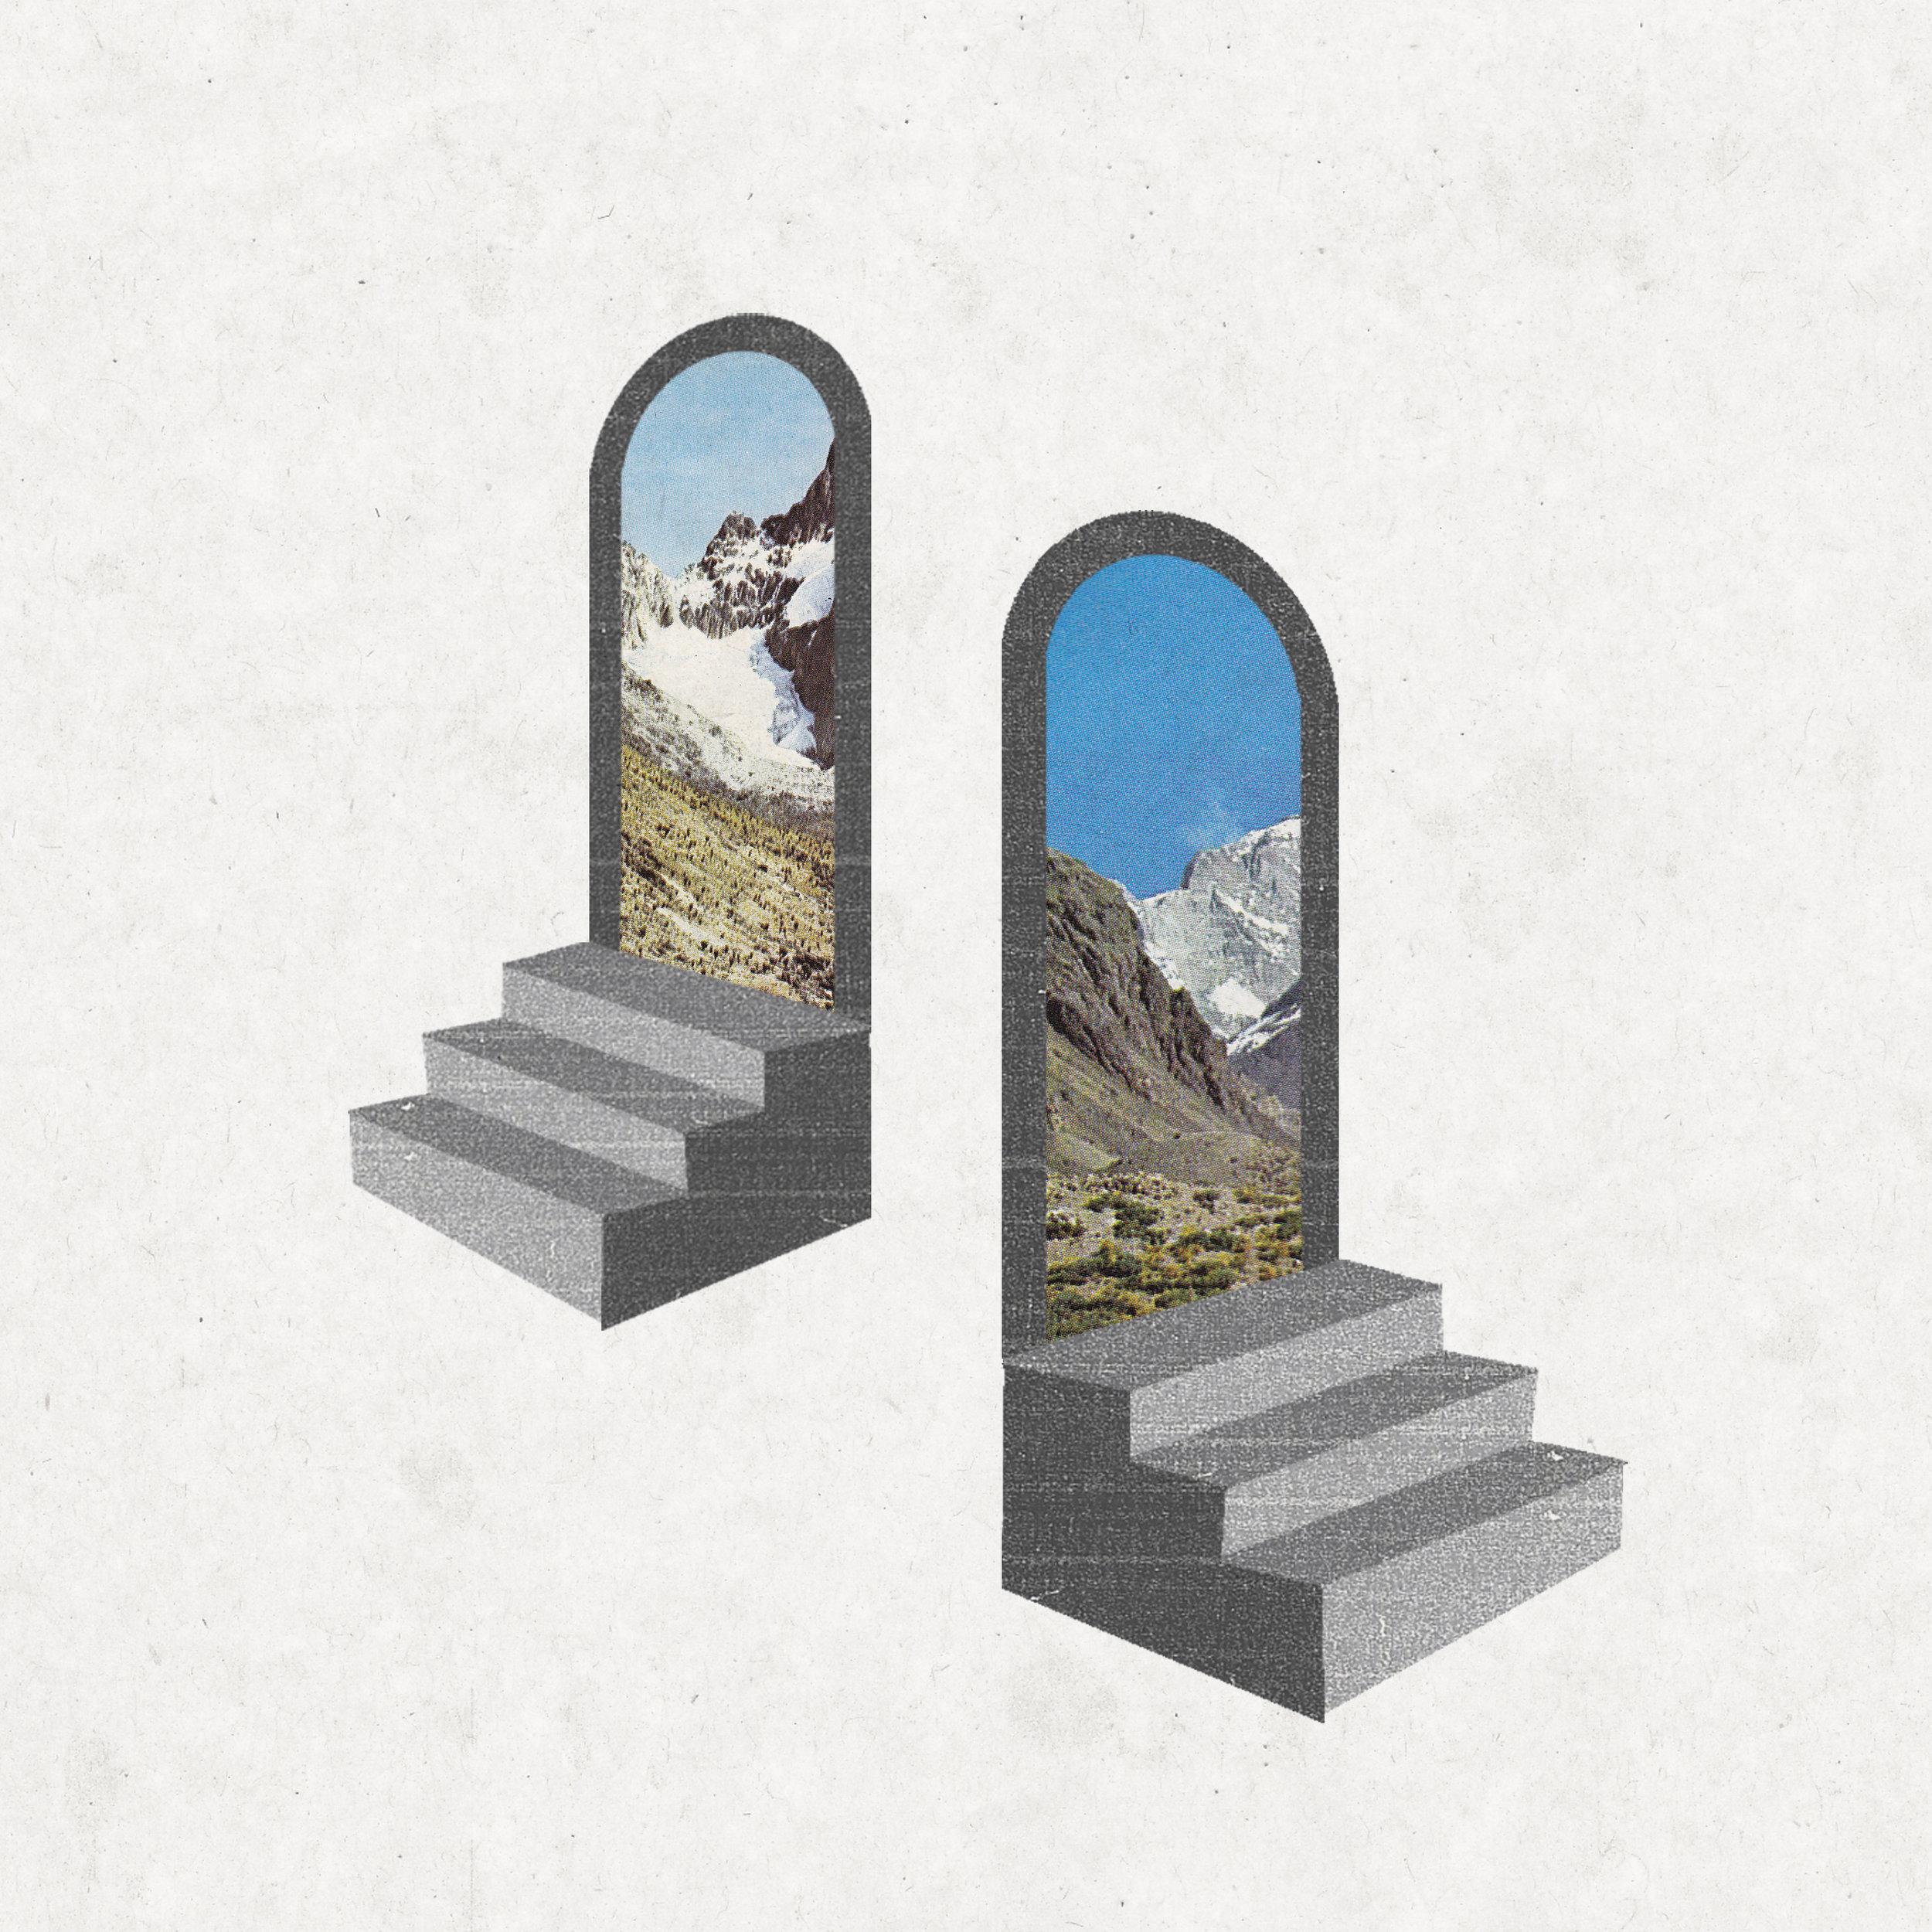 archdoors.jpg